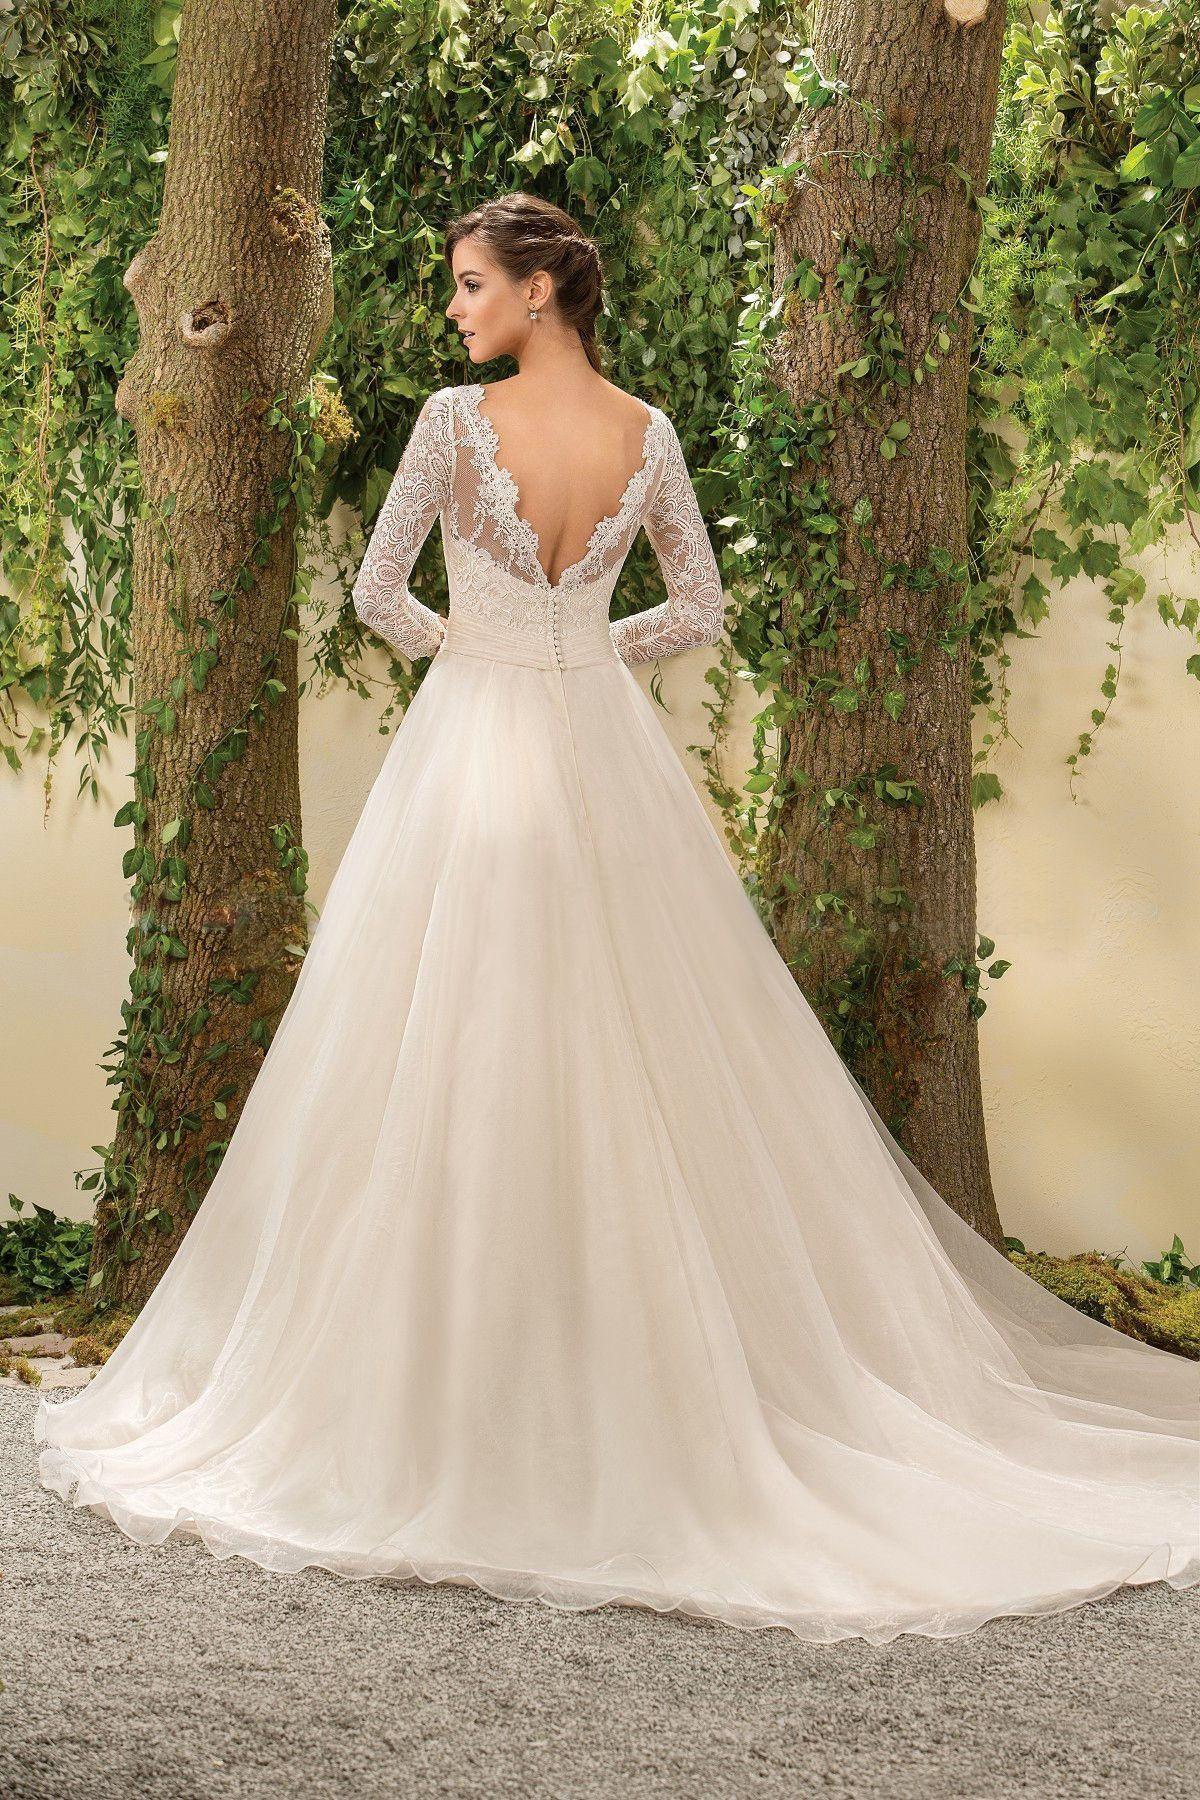 Long sleeve ball gown wedding dresses   uLong Sleeve Open Back Lace Bodice Ball Gown Wedding Dress